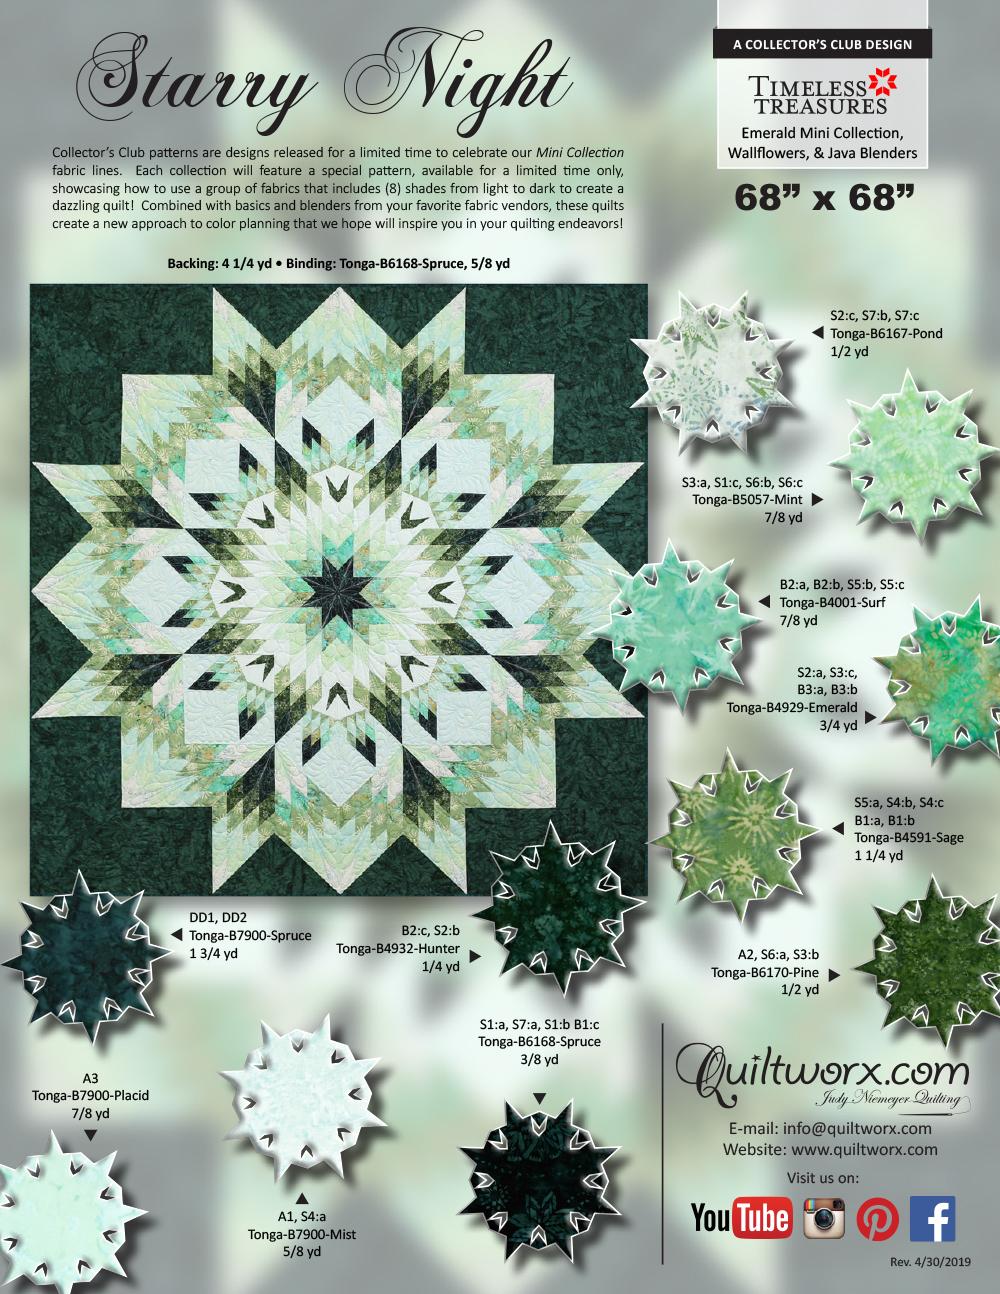 Starry-Night-Wall-Emerald-Wallflowers-1pg-KS